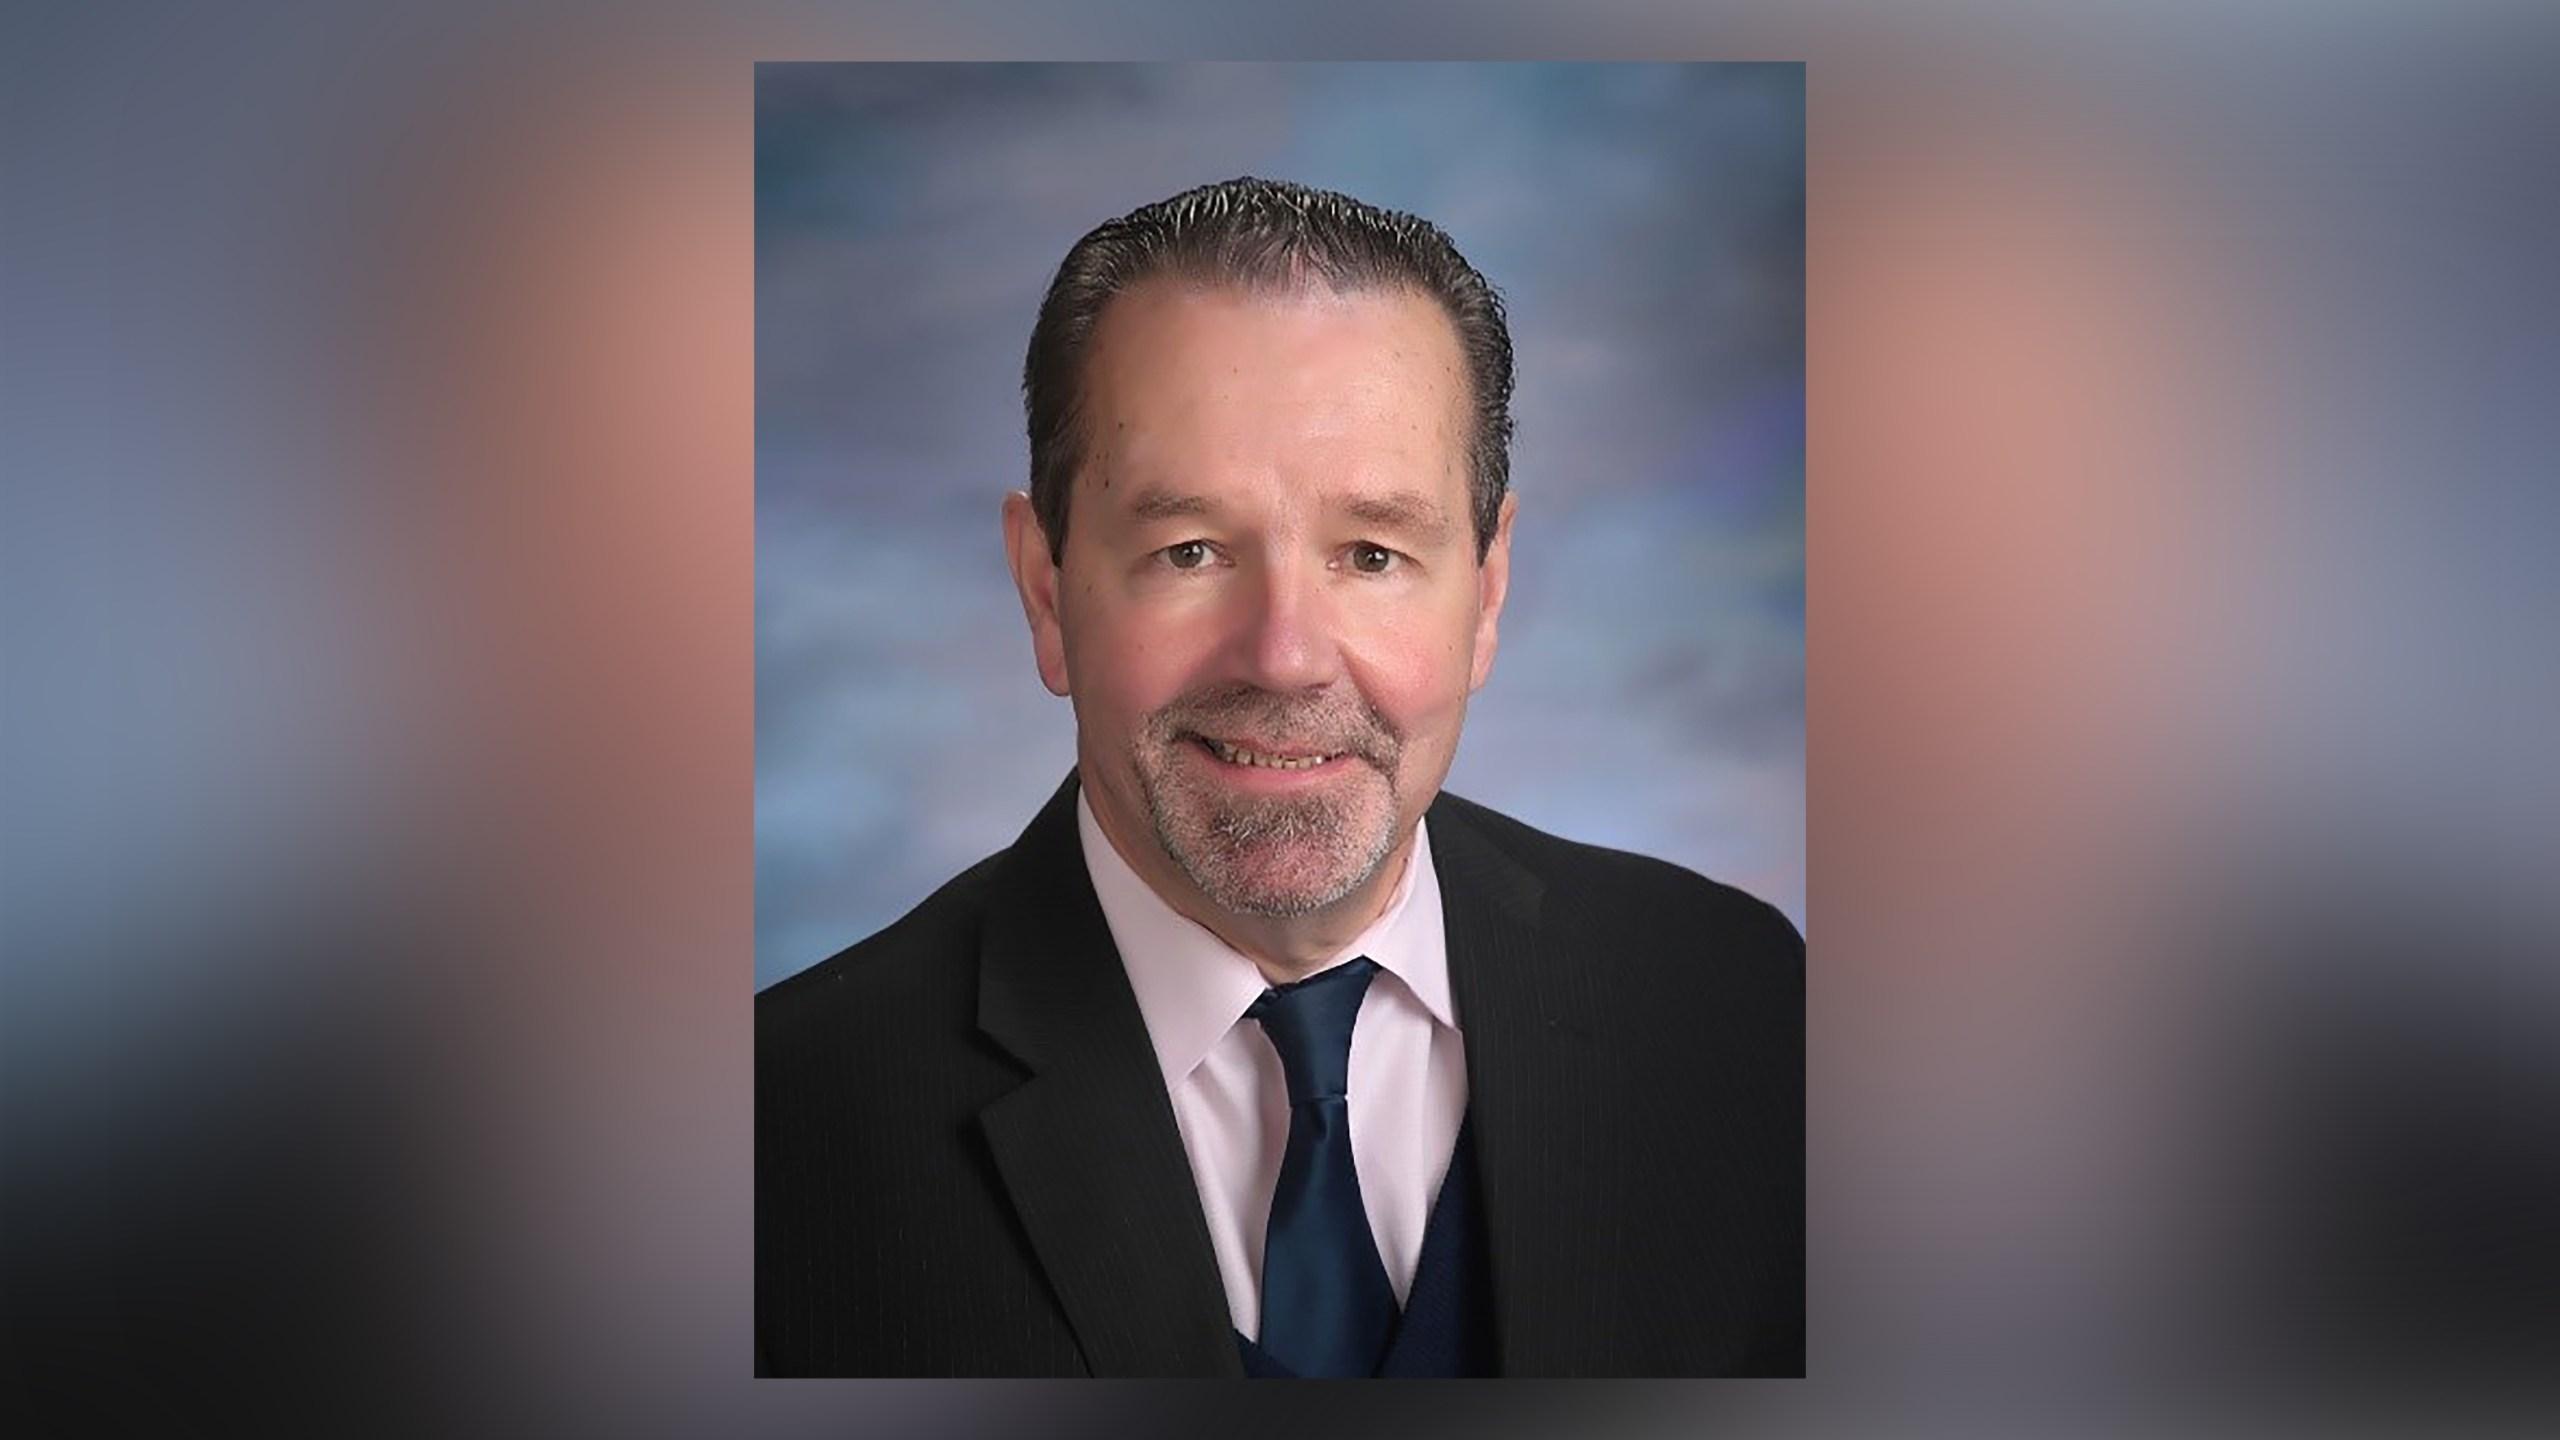 Jcc Halloween 2020 JCC Vice President for Academic Affairs announces retirement